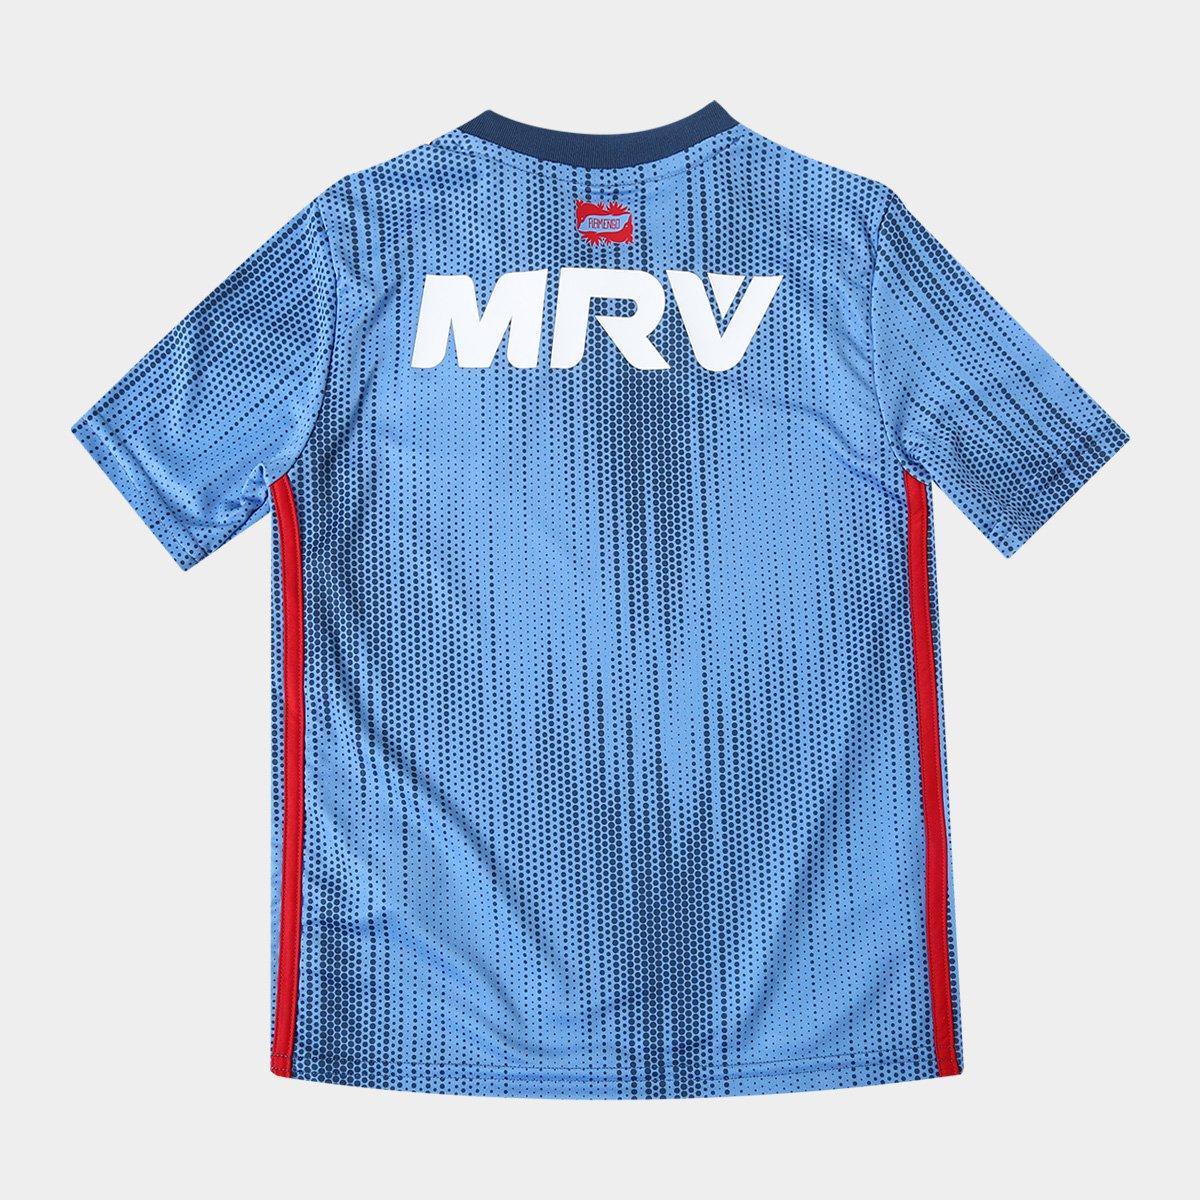 aa2b96f1e0 s Infantil Adidas Flamengo Azul 2018 III Torcedor n° Camisa 4zISqw4 ...